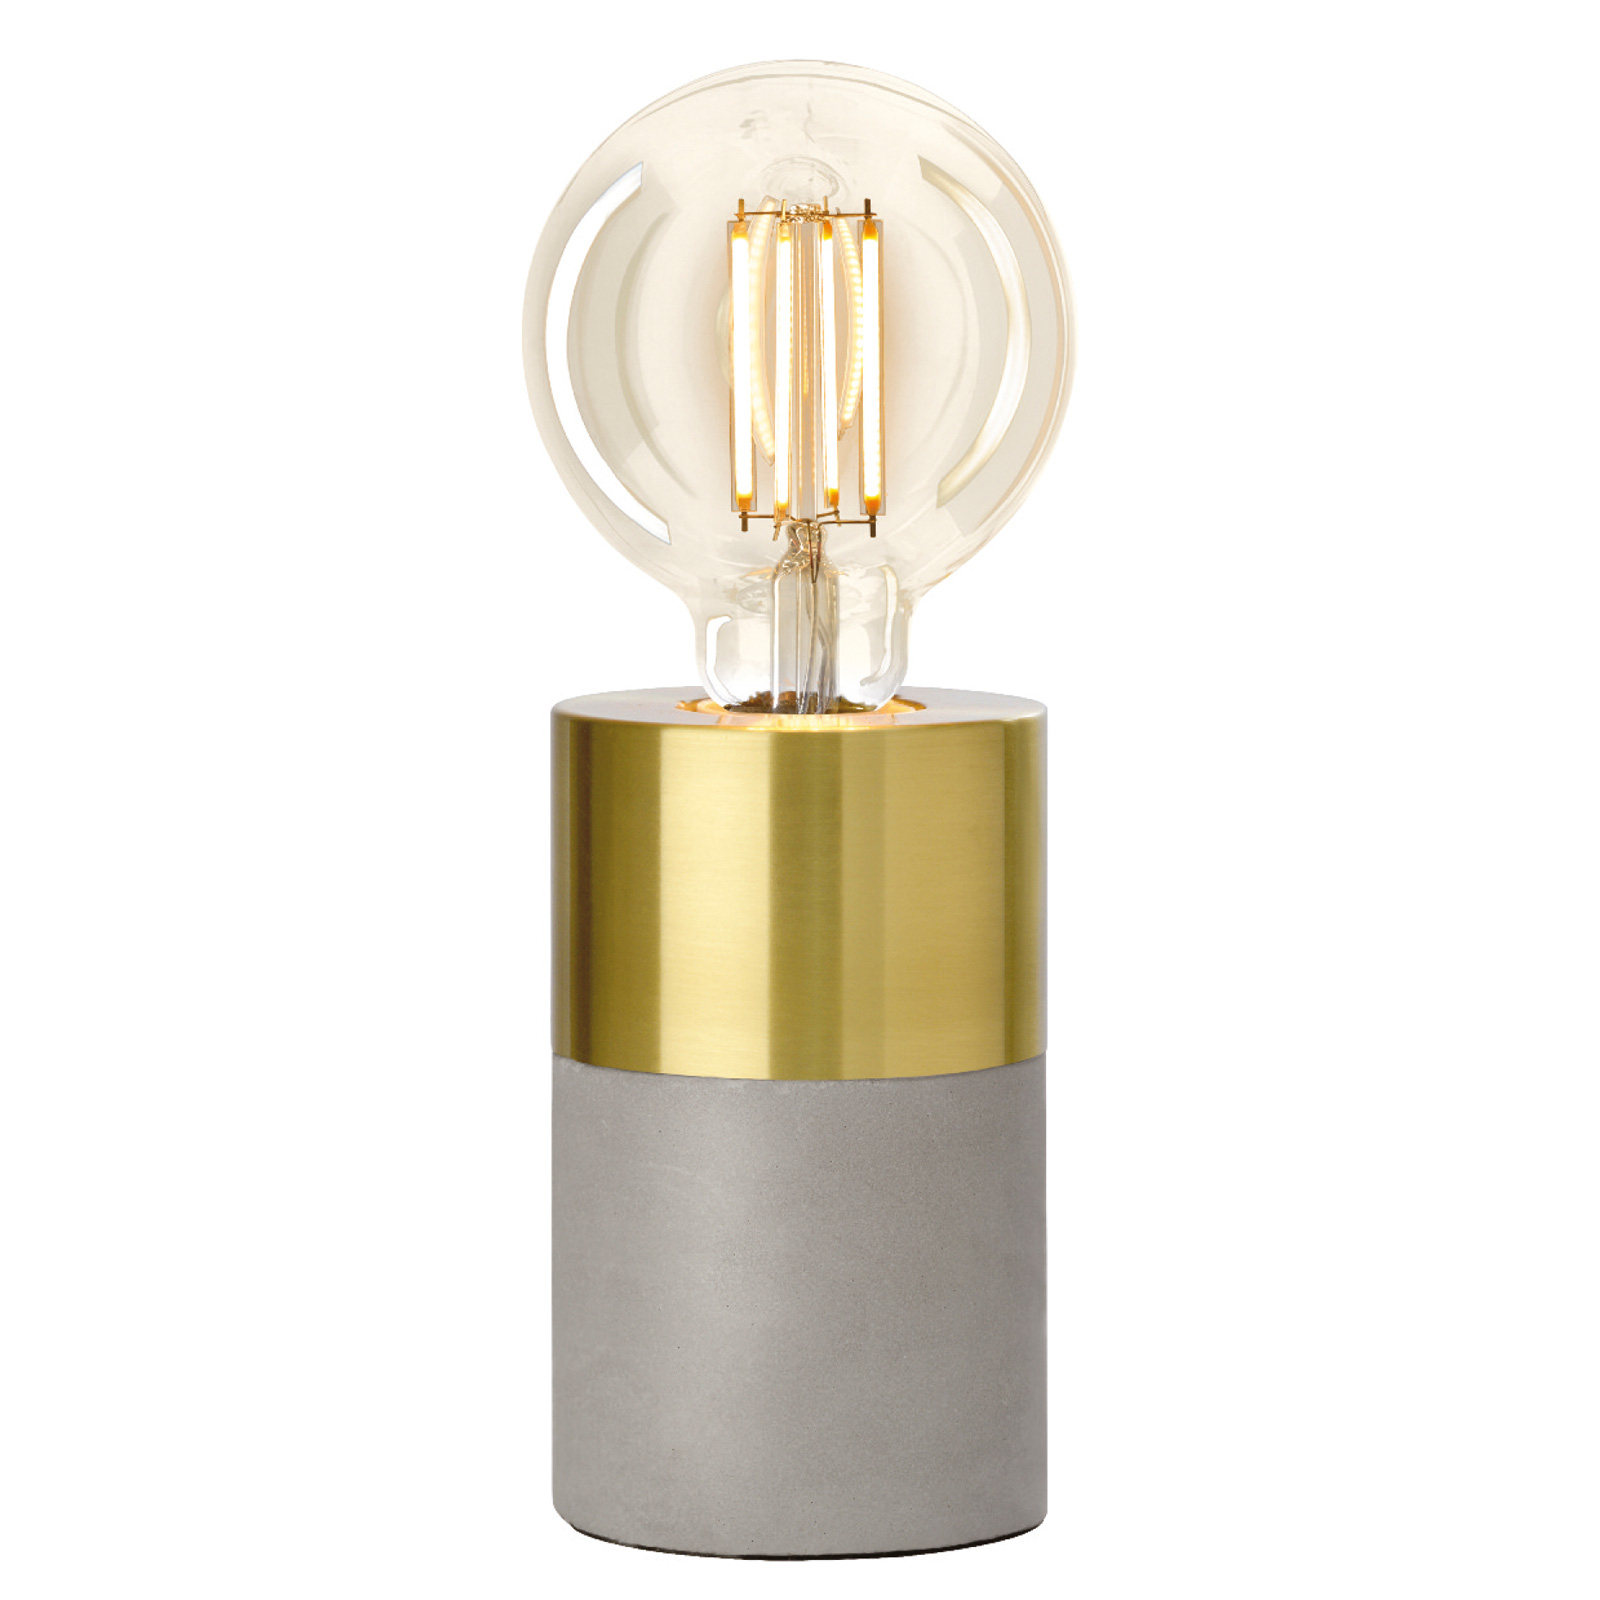 Villeroy & Boch Athen tafellamp in goudlook